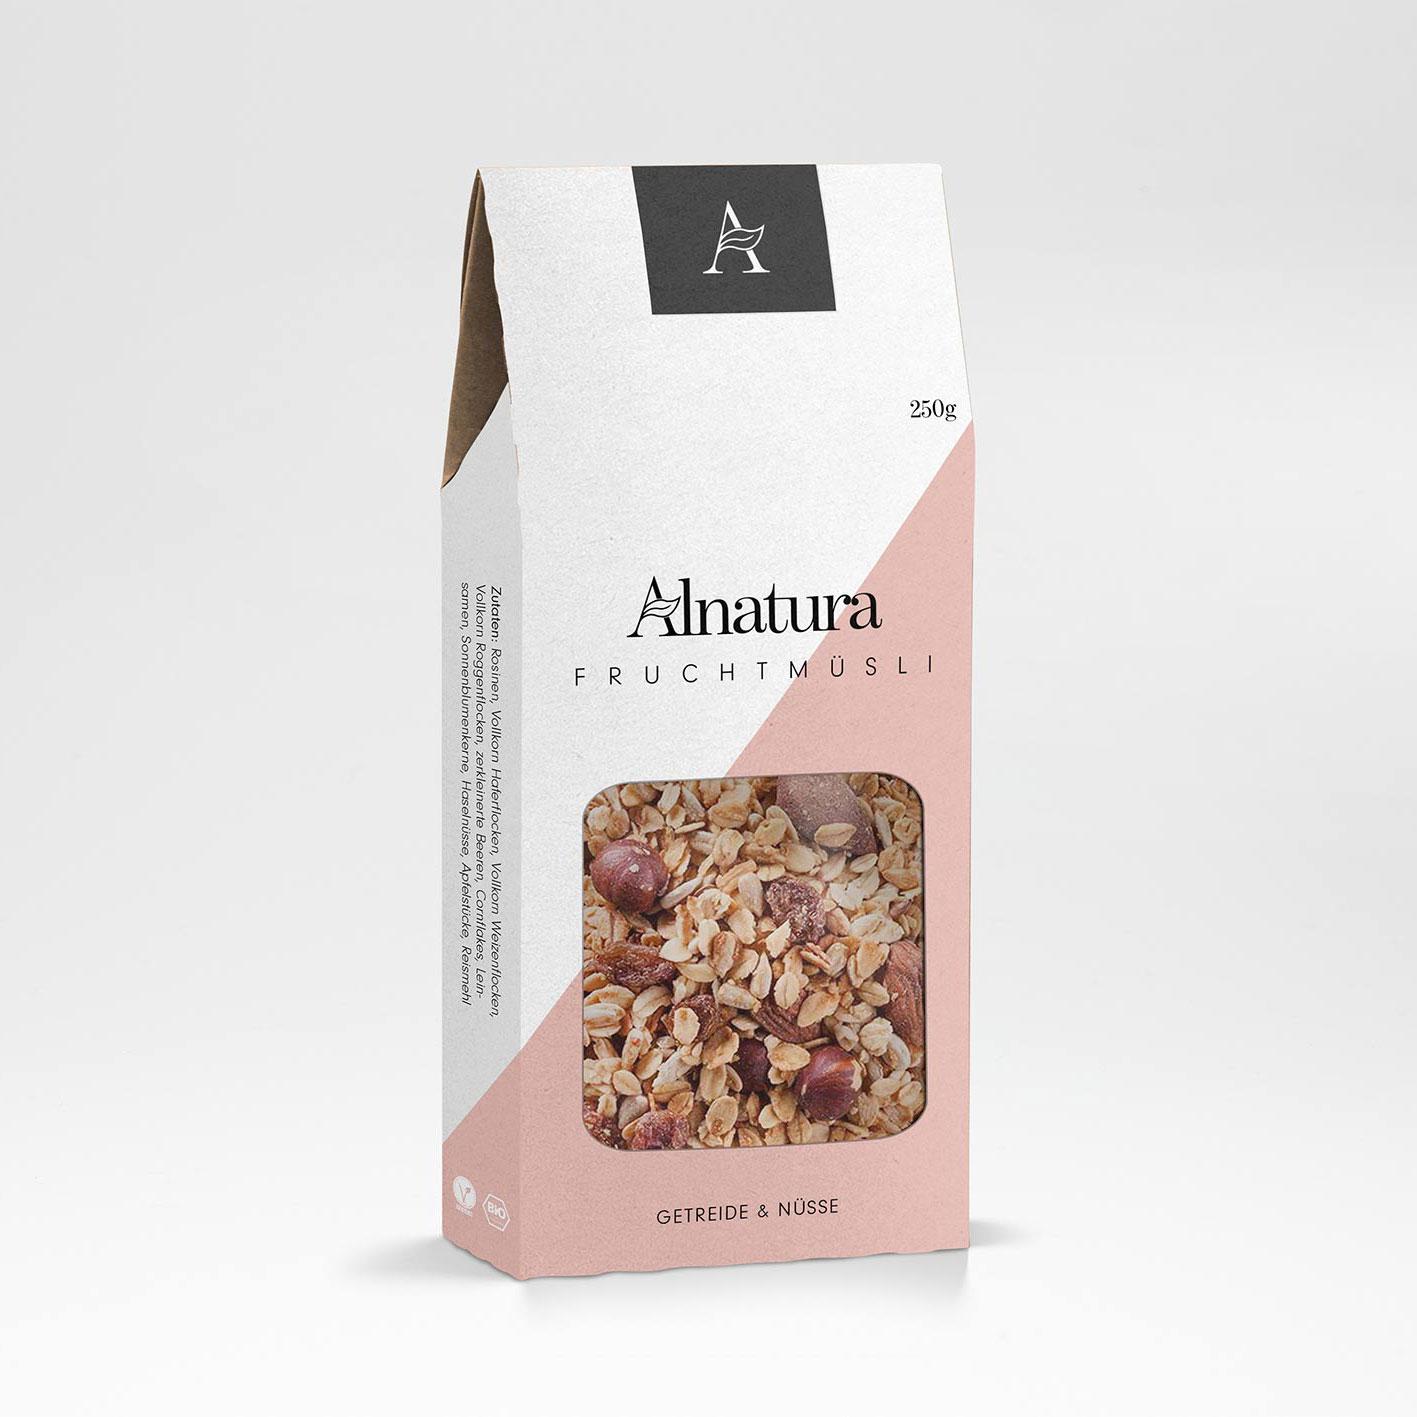 alnatura_packaging_03_SQUARE